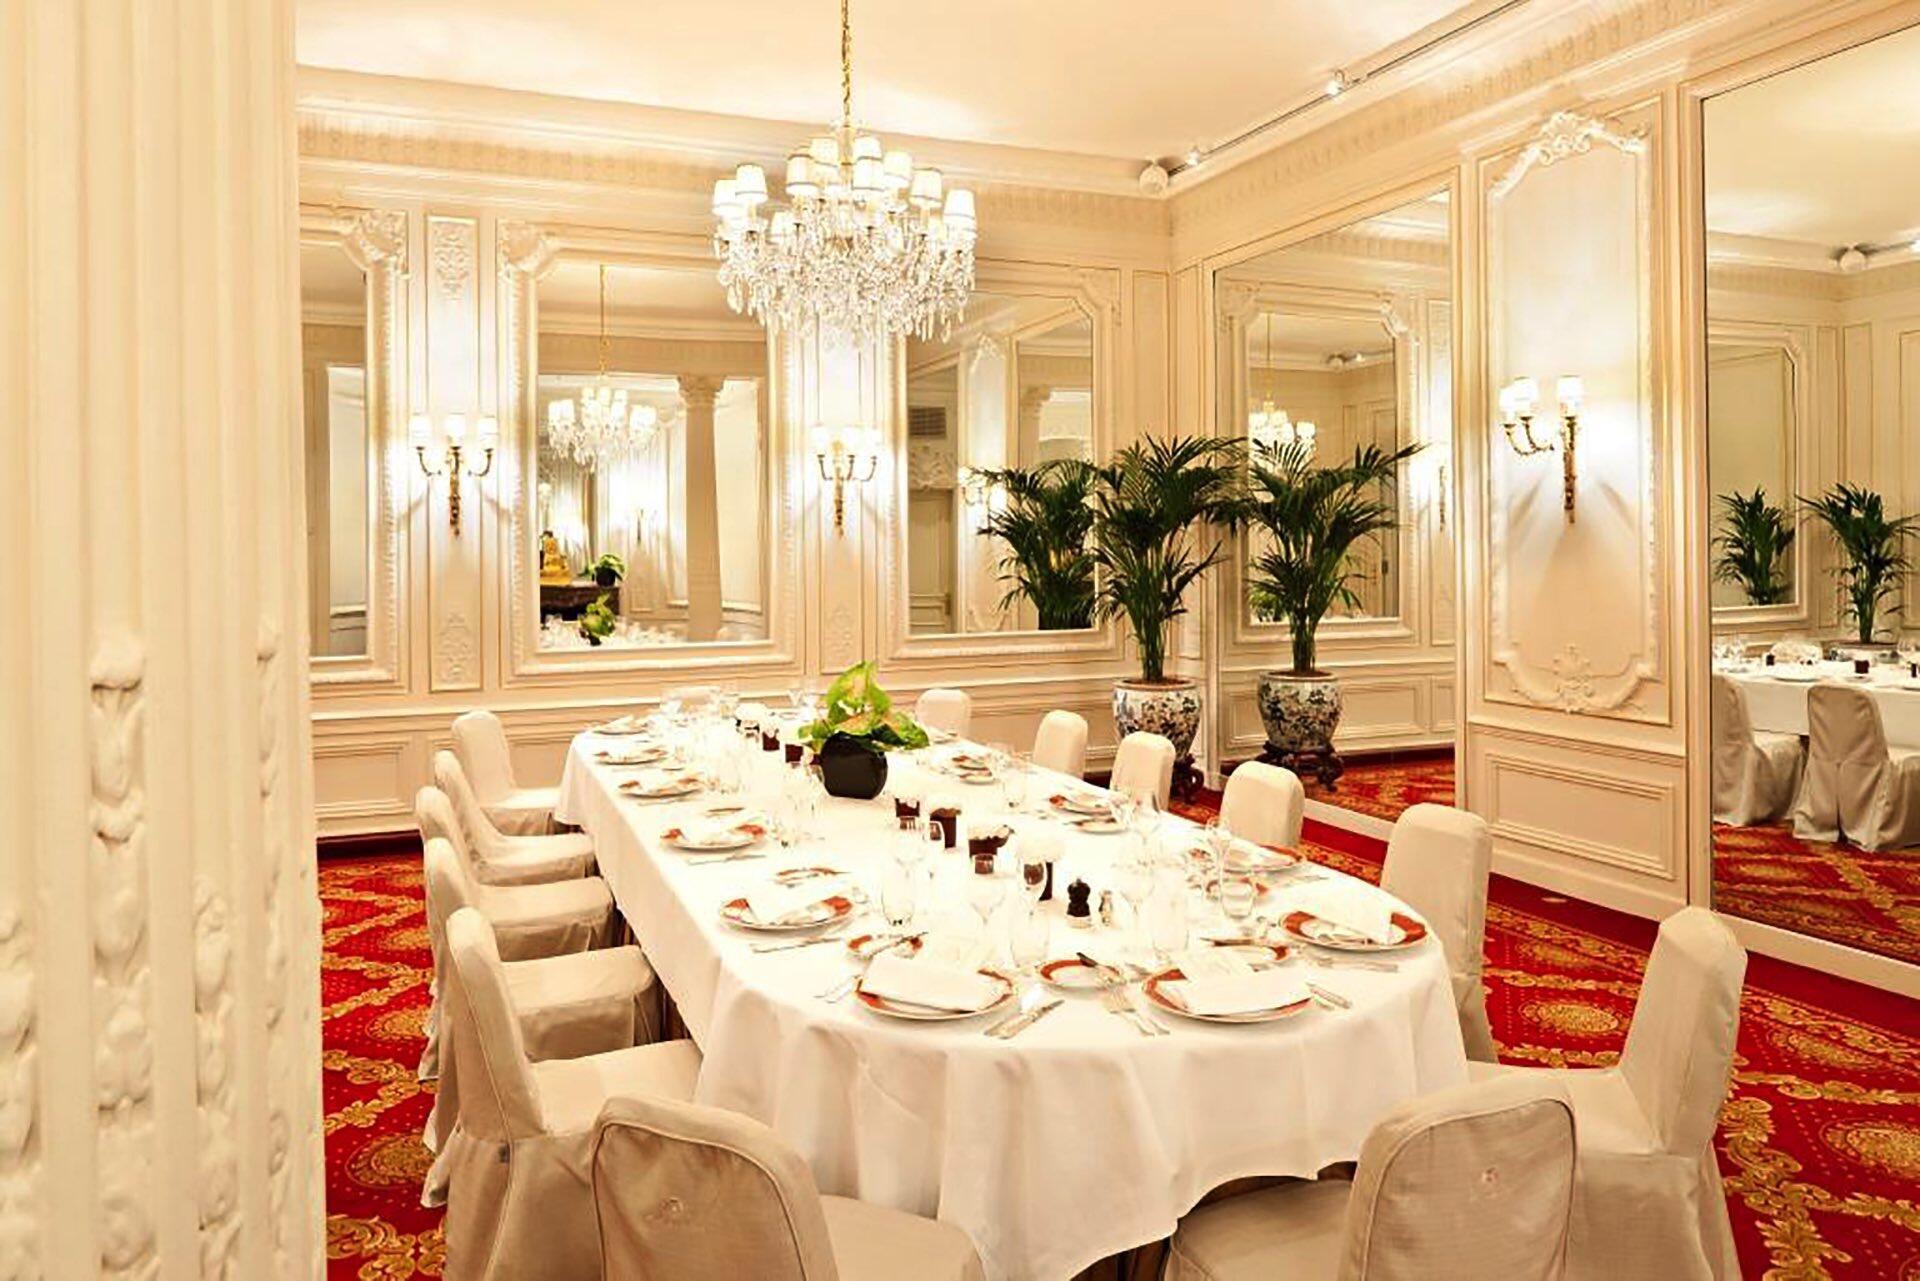 Seminairs et Banquets _ Meeting Room 6